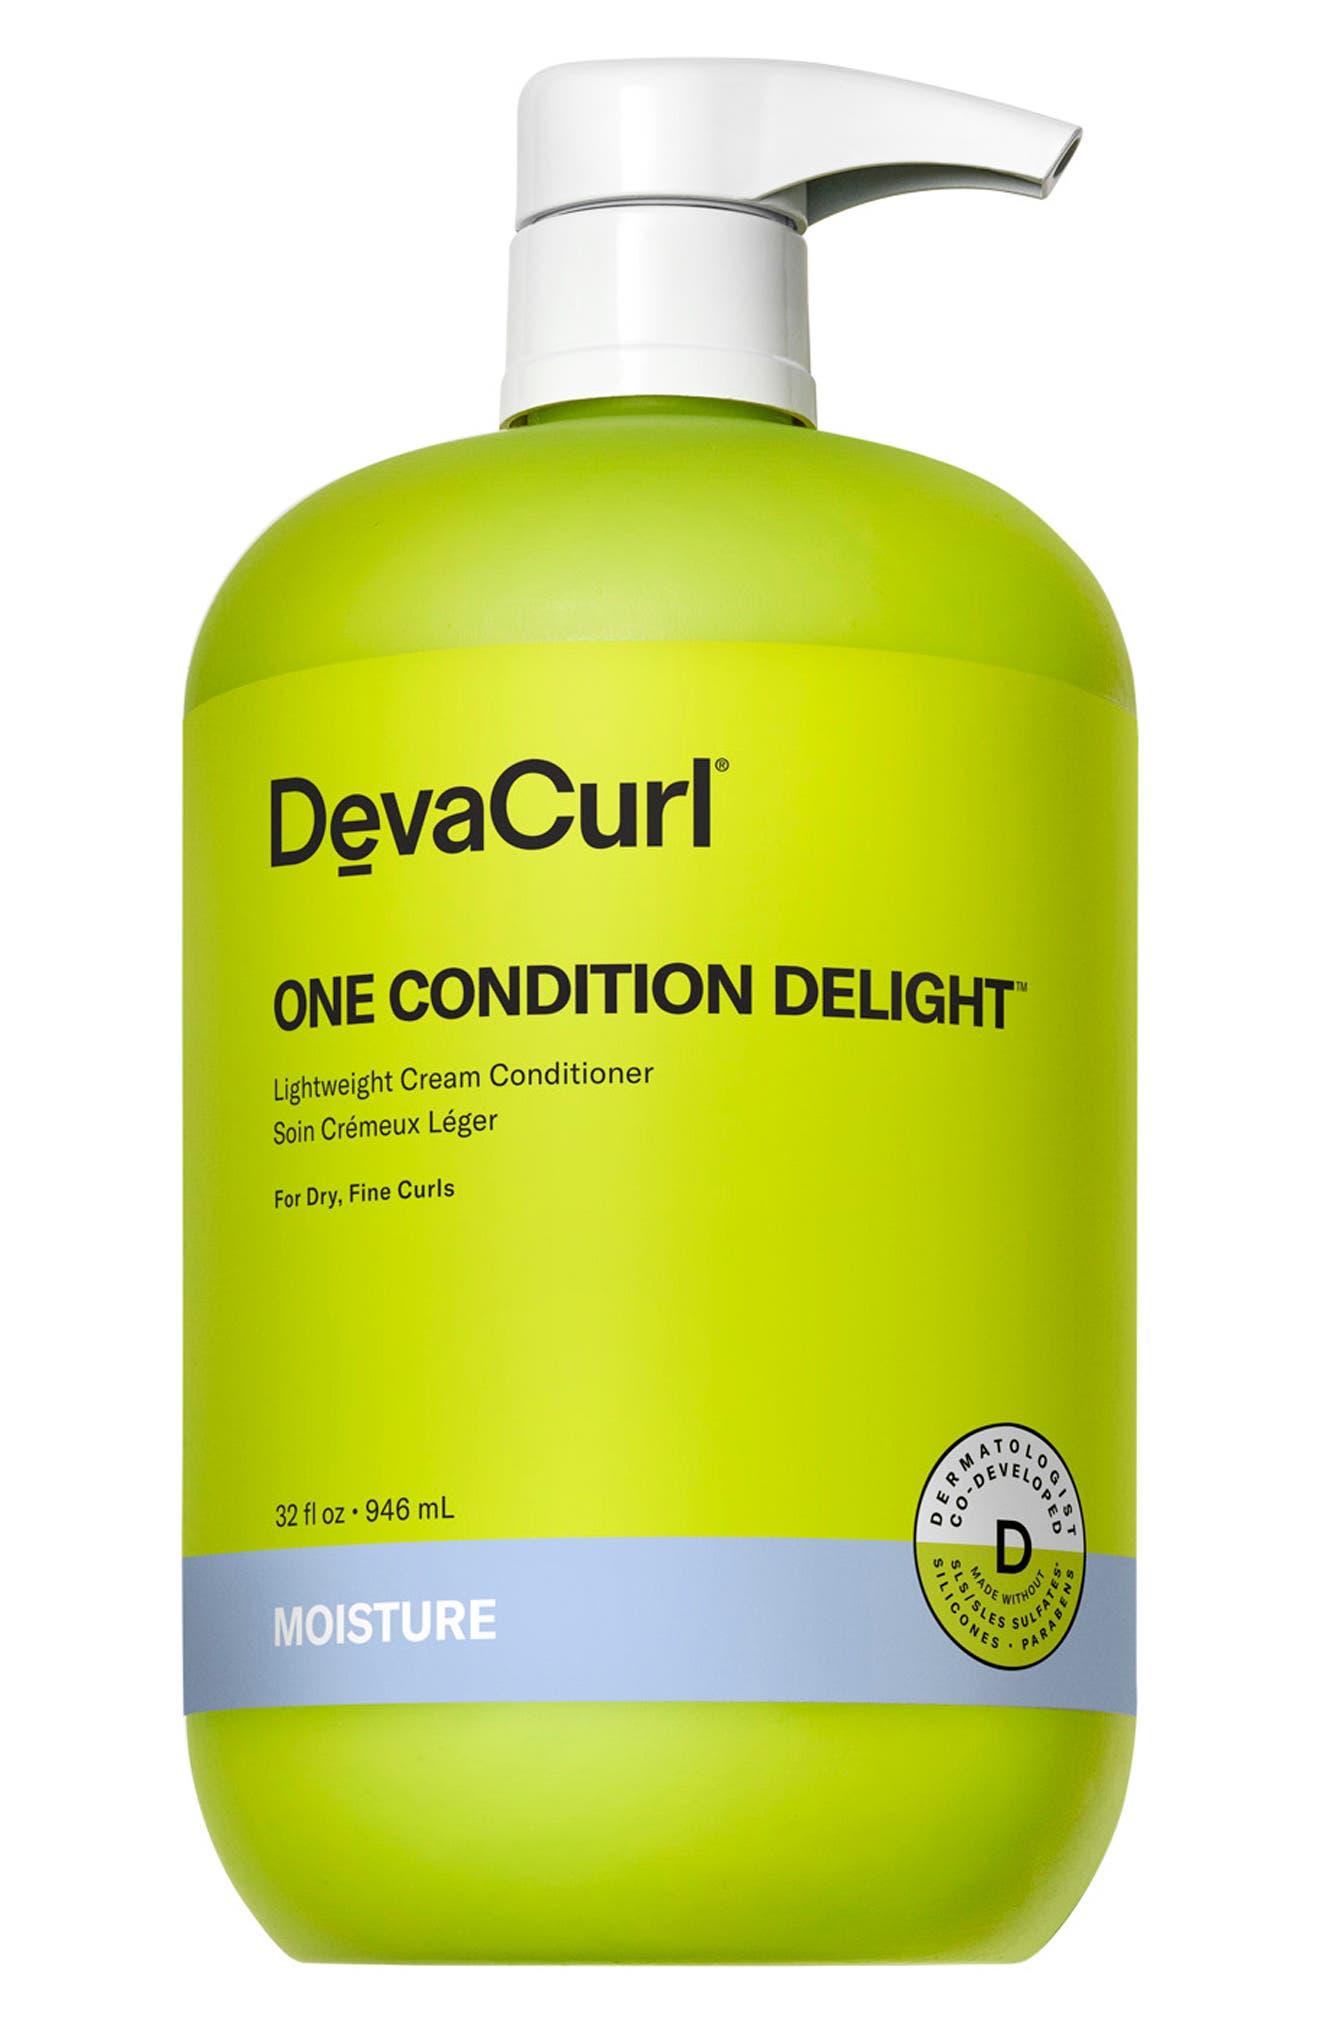 DevaCurl Jumbo One Condition Delight(R) Lightweight Cream Conditioner